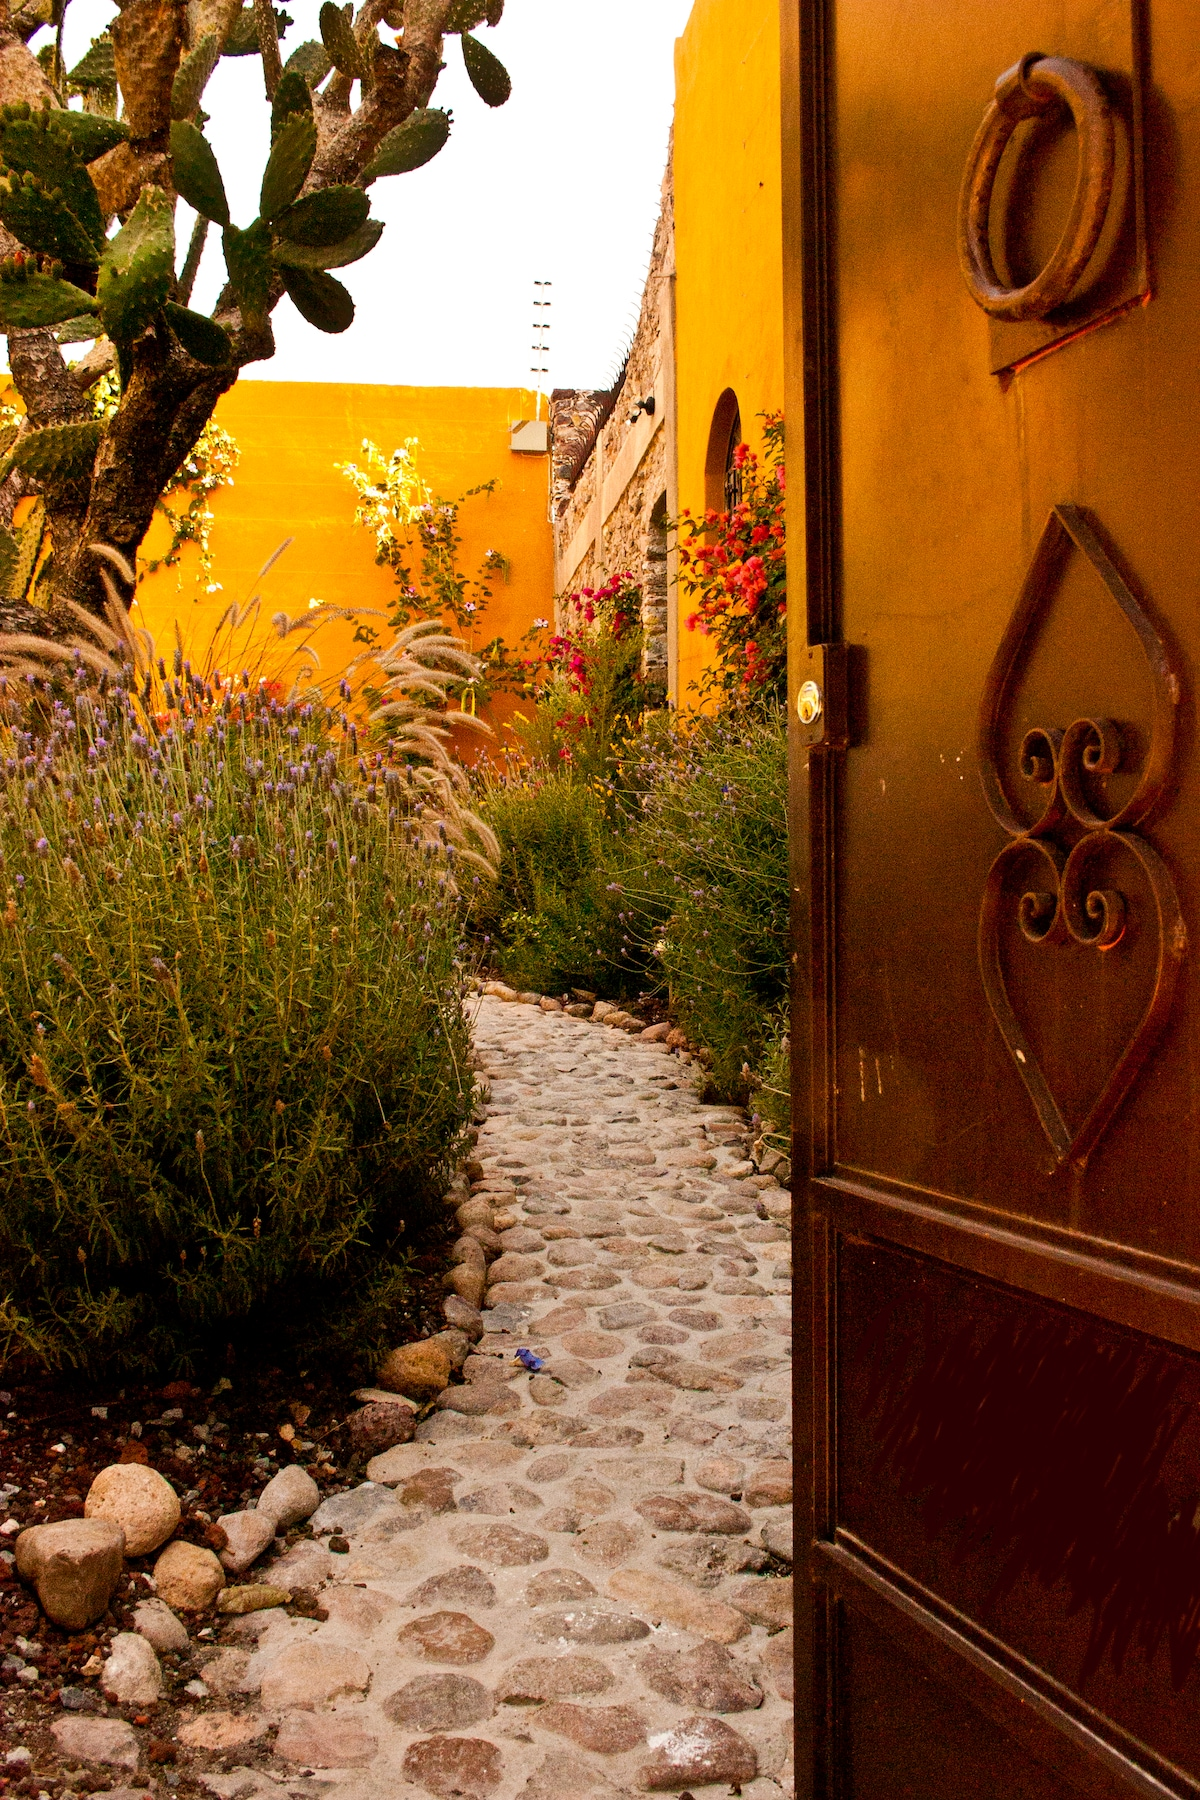 Private Entrance Off Street thru Garden